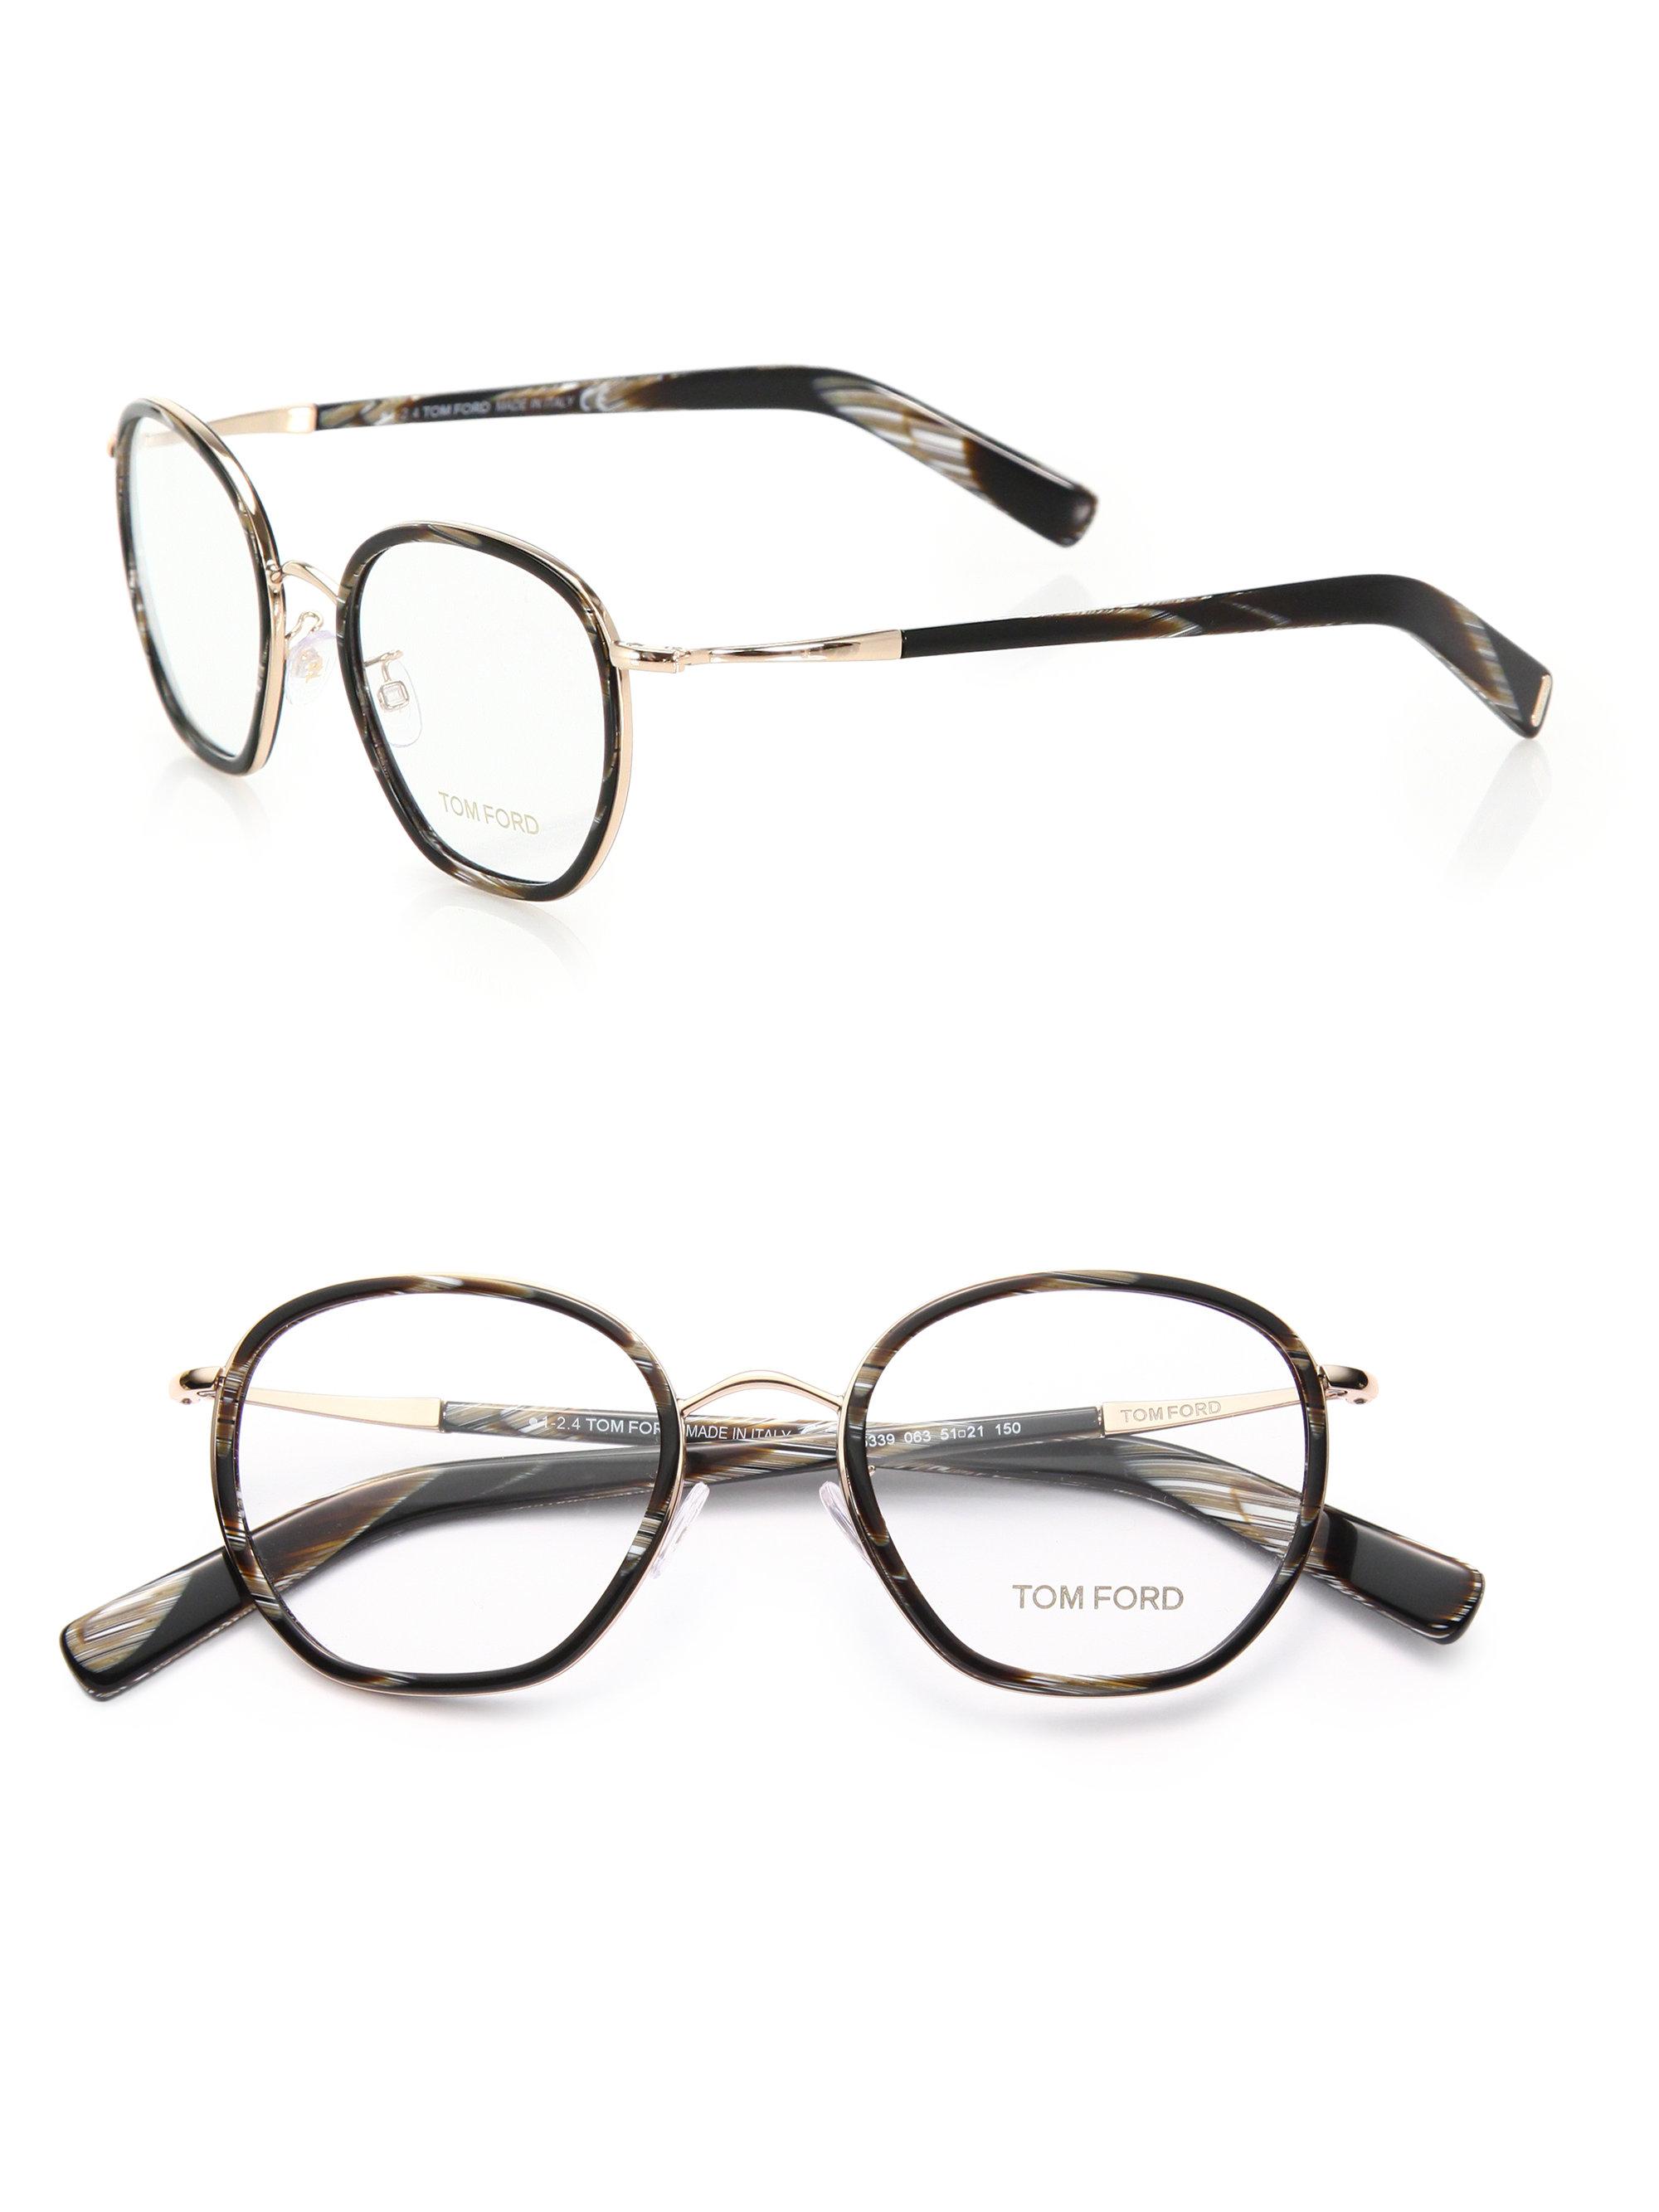 488fd4818fb6c Tom Ford 51mm Round Acetate   Metal Optical Glasses in Black - Lyst